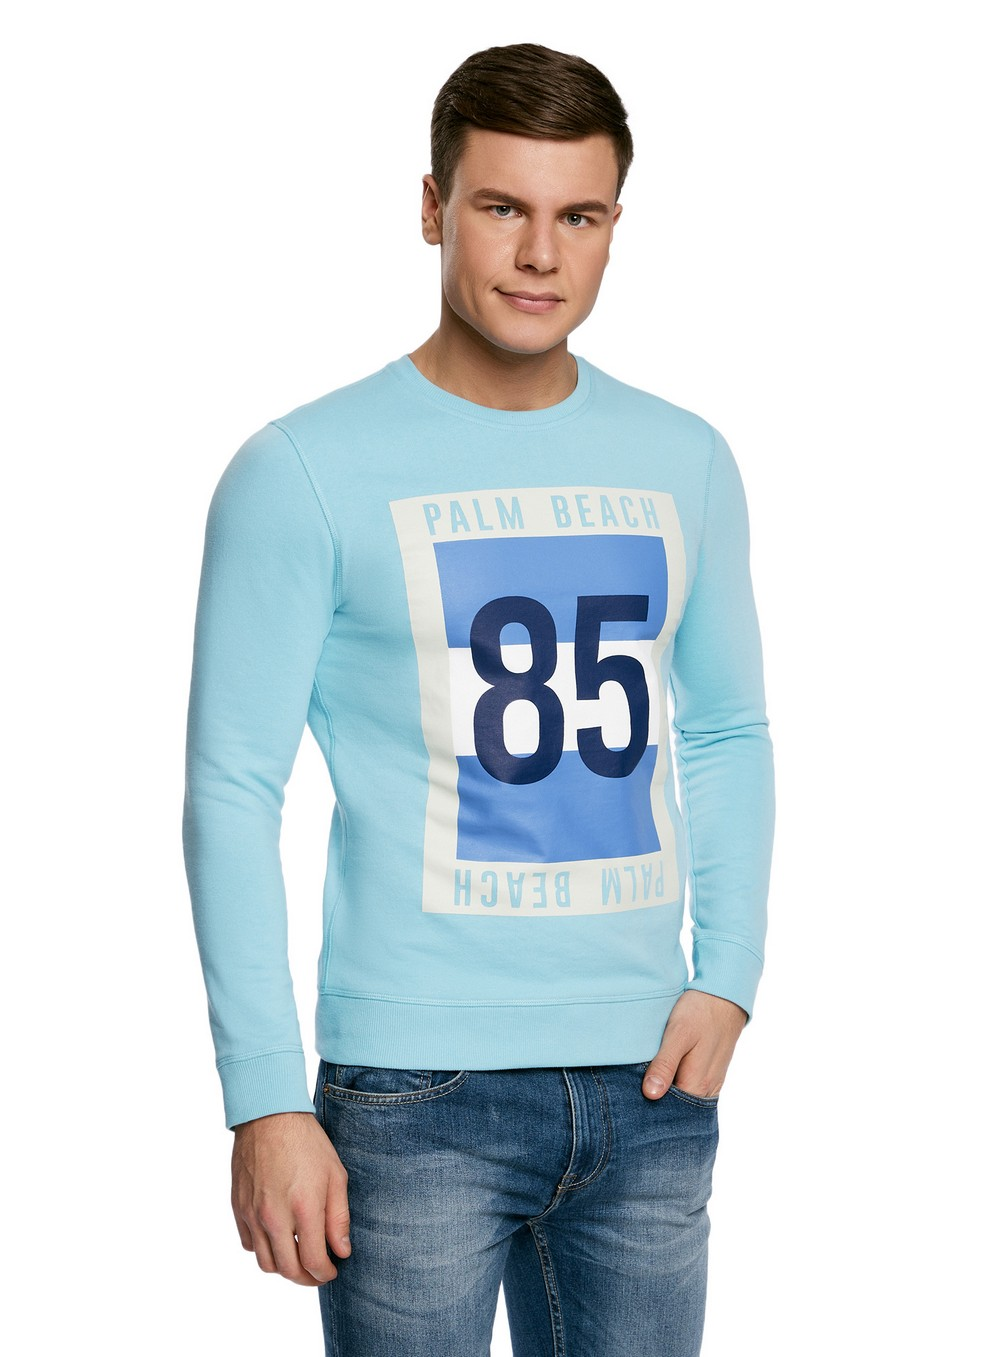 Sweatshirts  for men 5L113086M-44382N black lantern sleeves sweatshirts